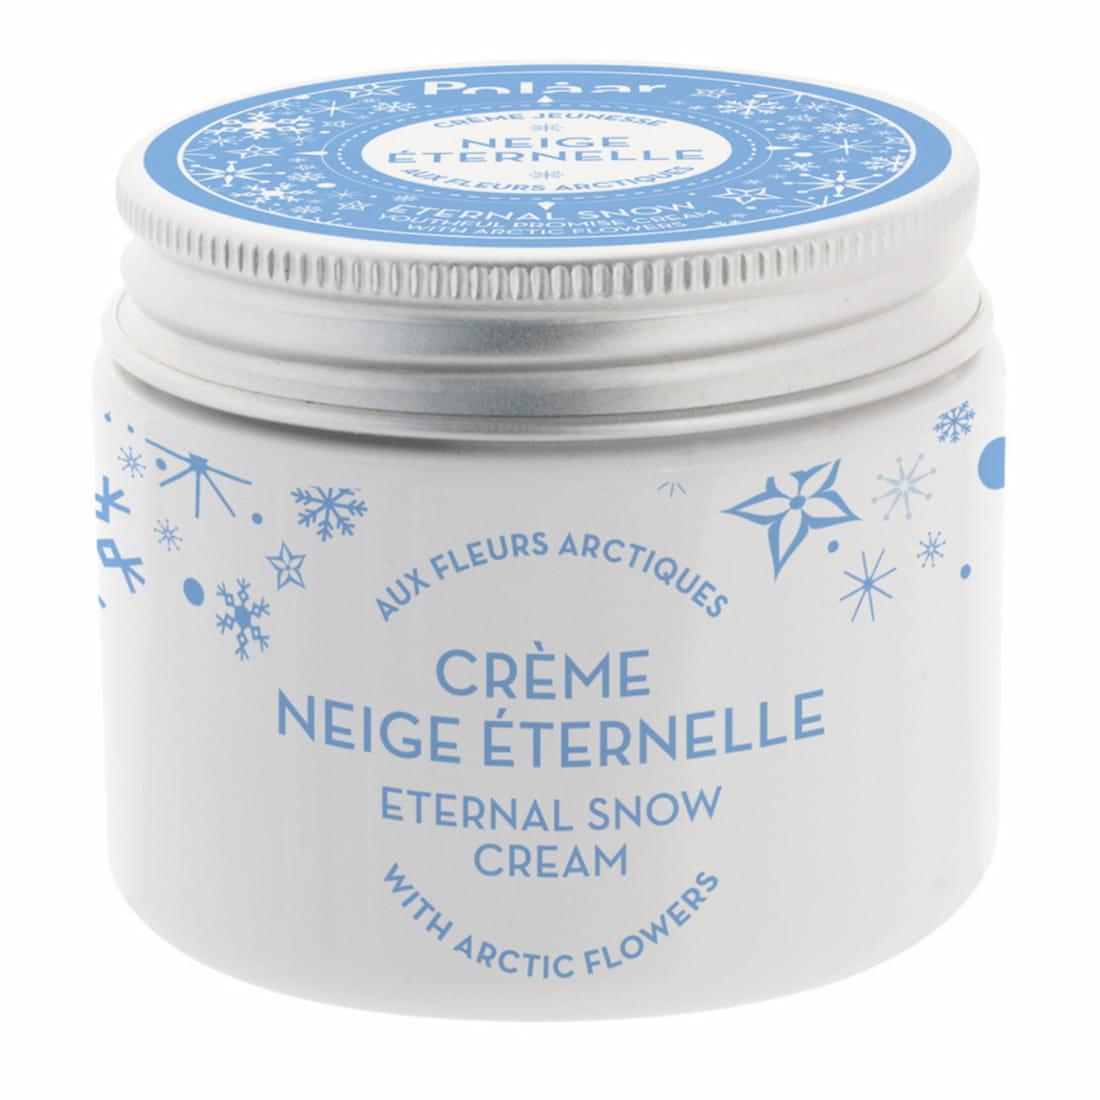 Polaar - Neige Eternelle - Crème jeunesse